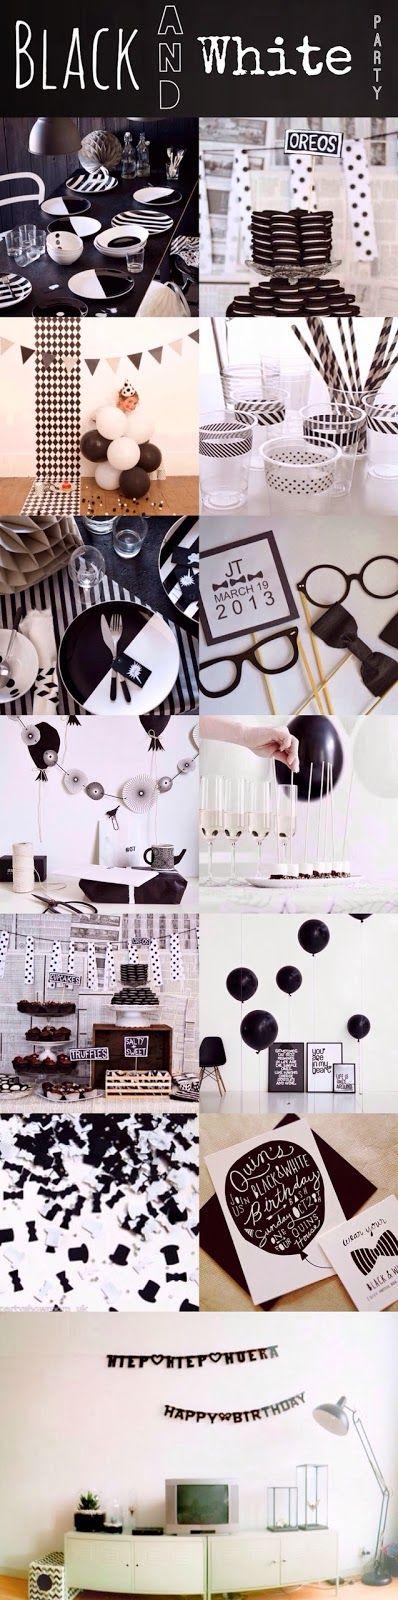 Black White Theme Party Ideas || onihomemade.blogspot.com ||